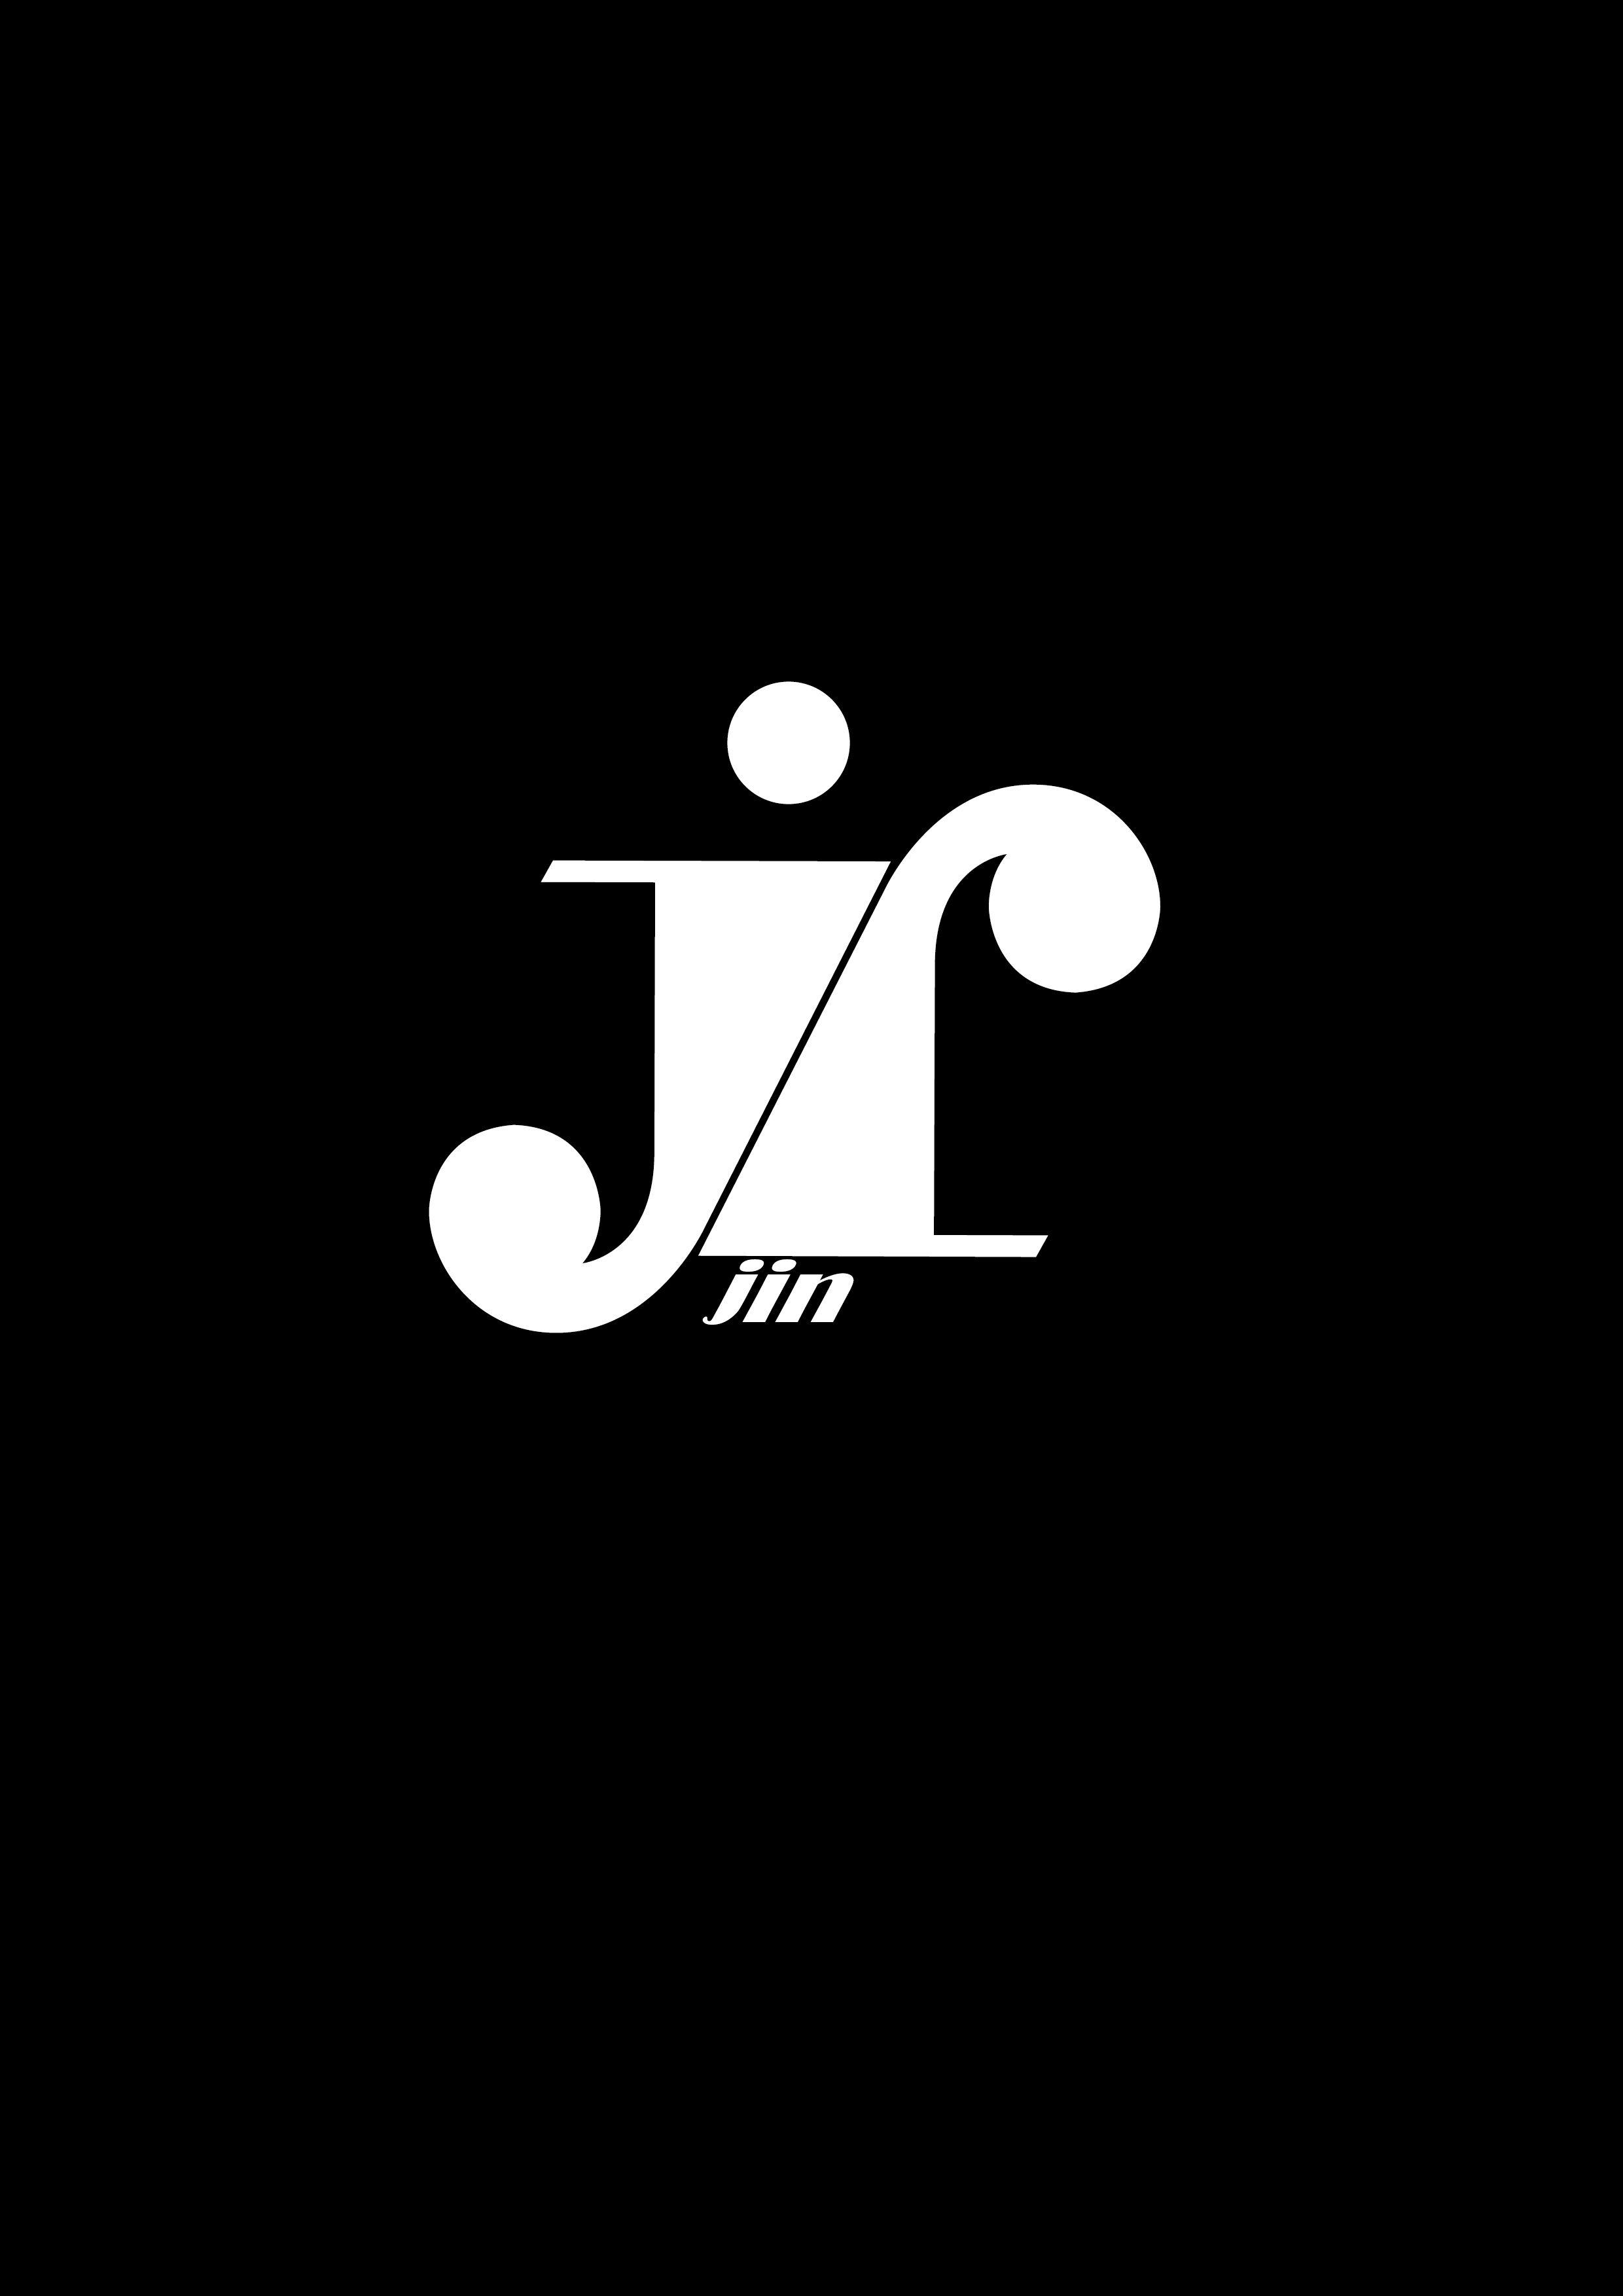 Furniture logo inspiration - Personal Logo Character J 20 Creative Furniture Logo Designs And Inspiration Artatm